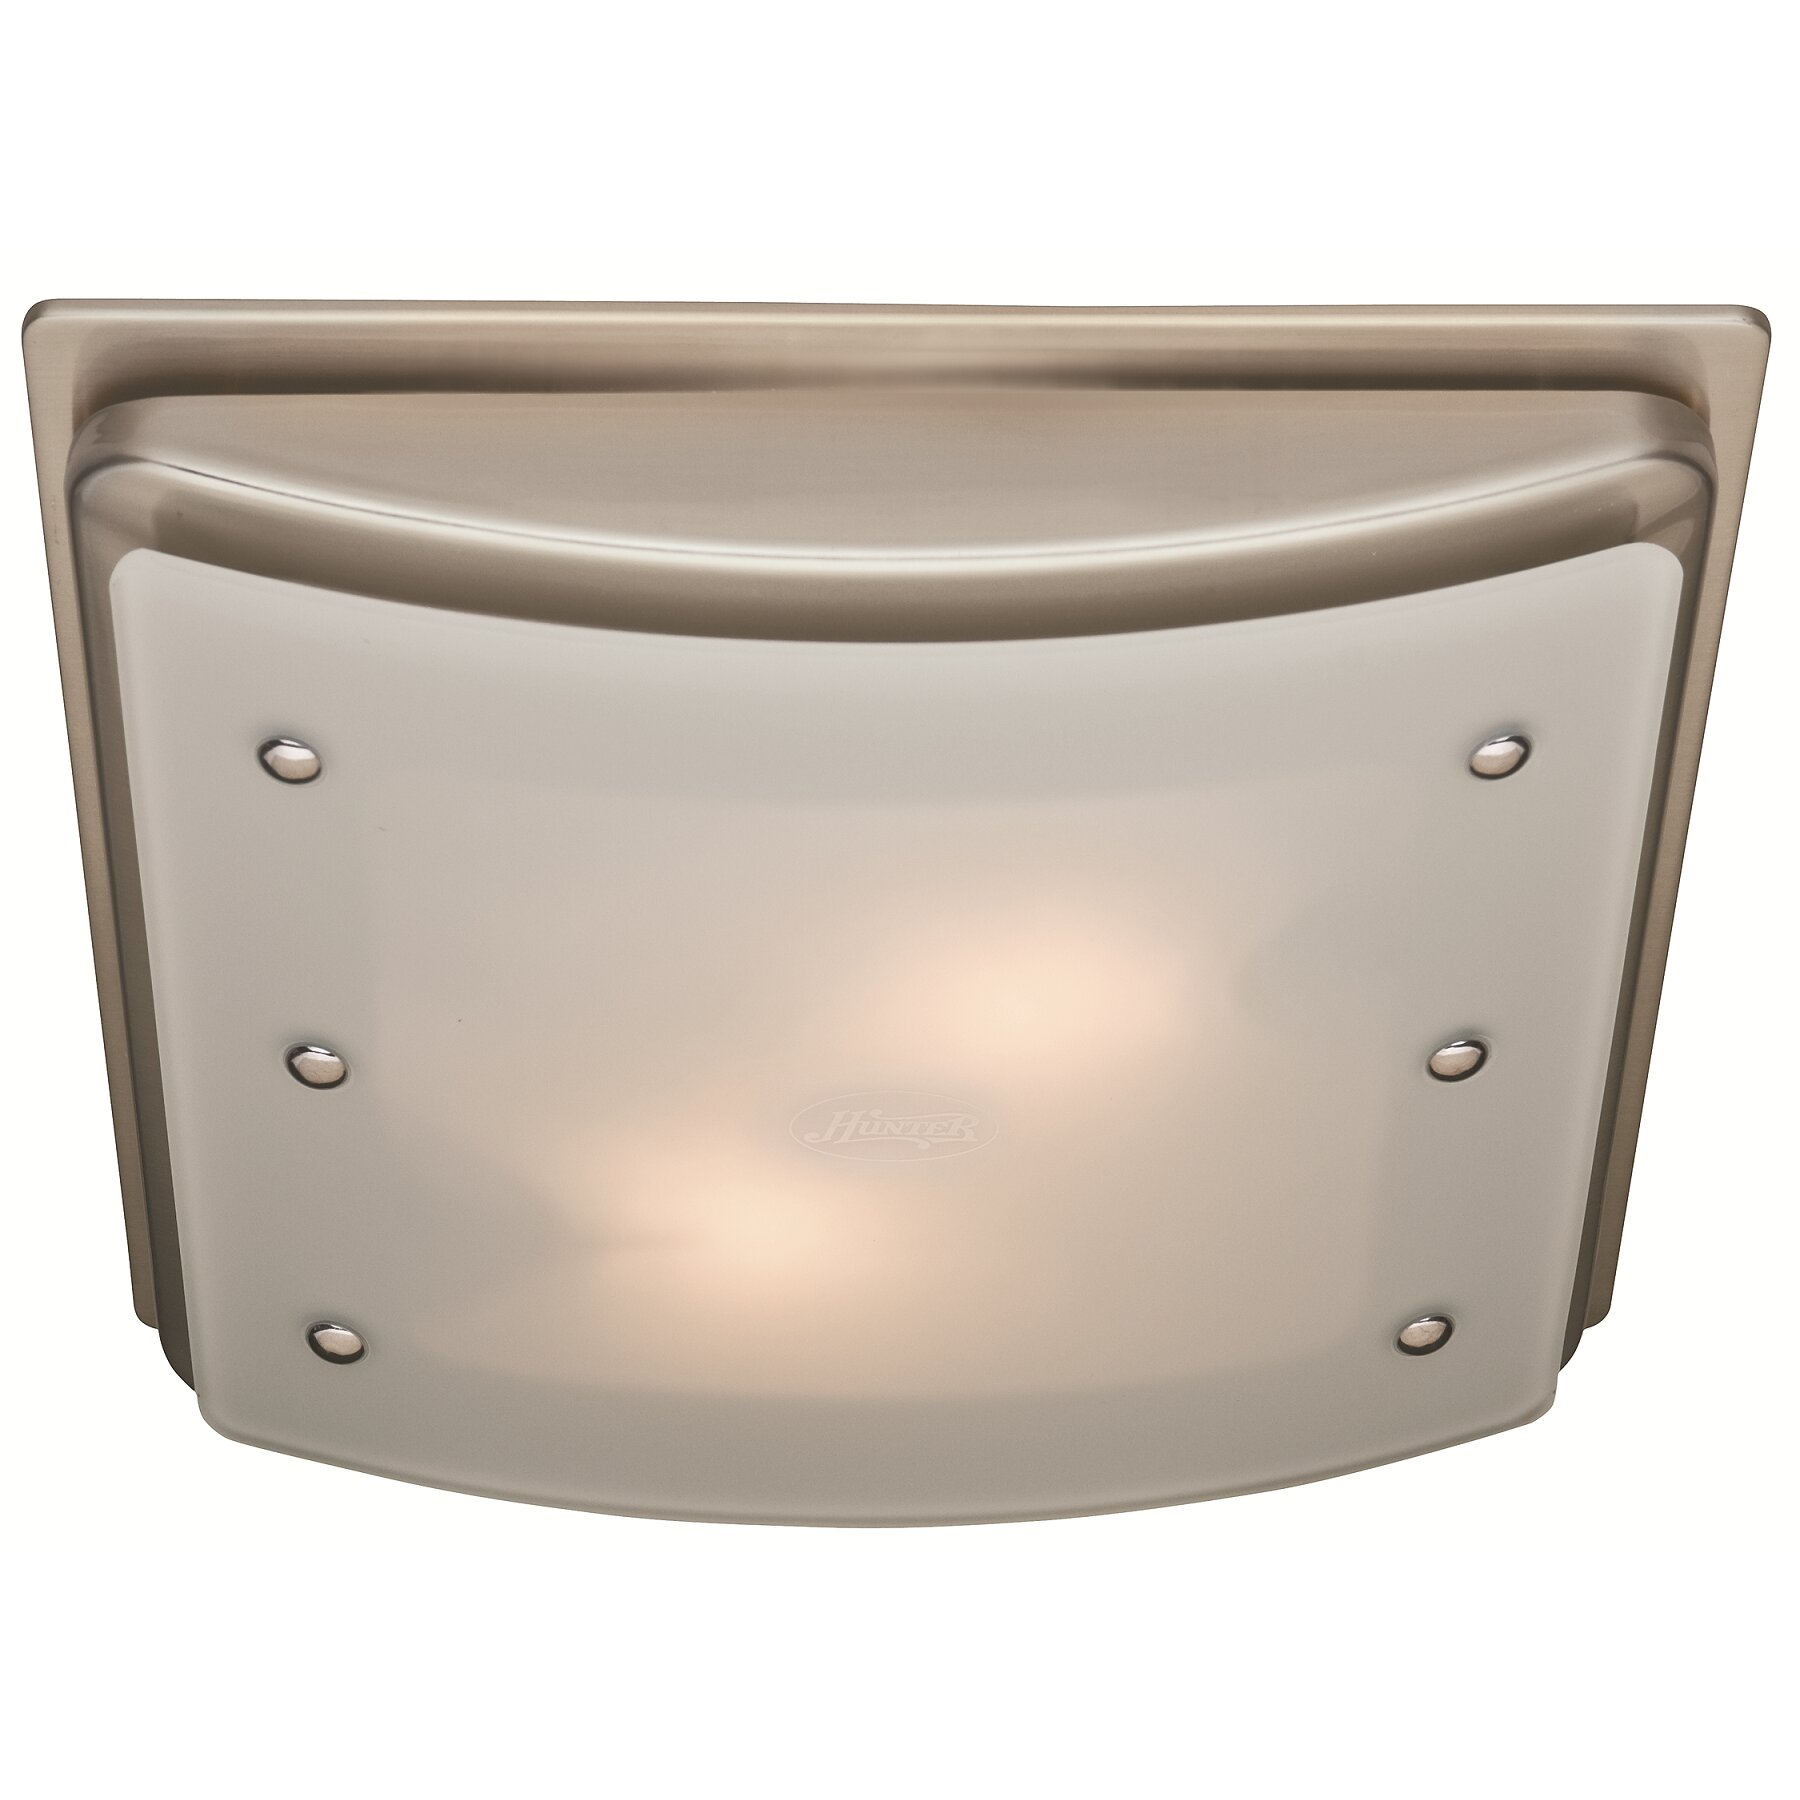 Bathroom Fans You'll Love | Wayfair:Ellipse 100 CFM Bathroom Fan with Light,Lighting